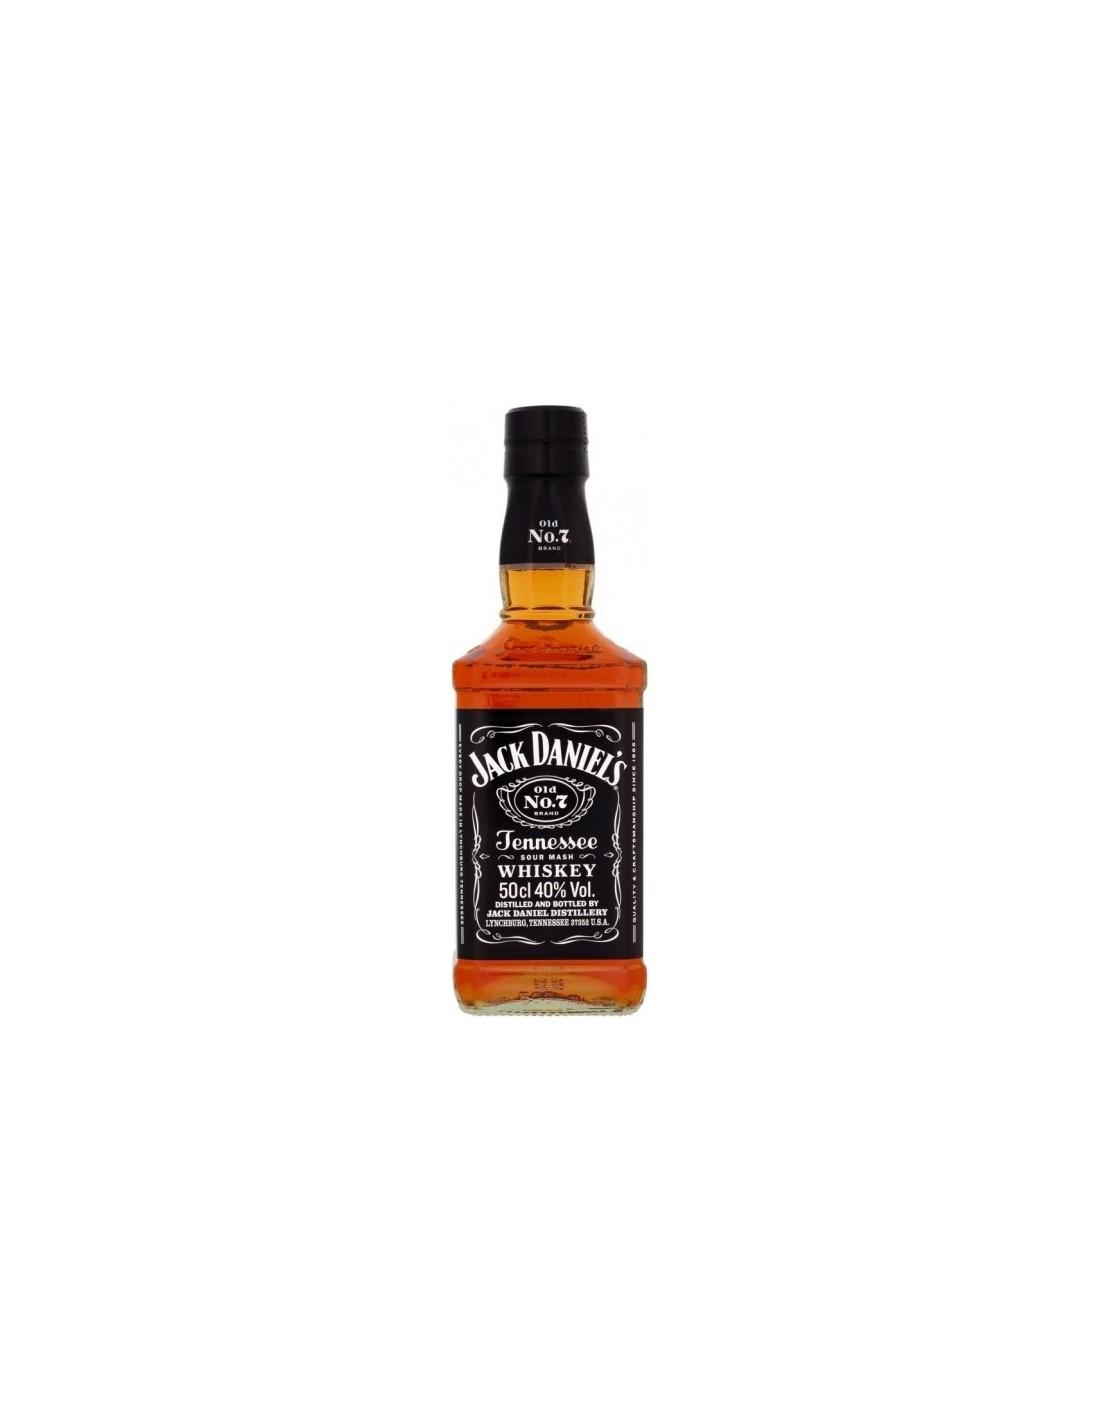 Whisky Bourbon Jack Daniel's, 40% alc., 0.5L, America